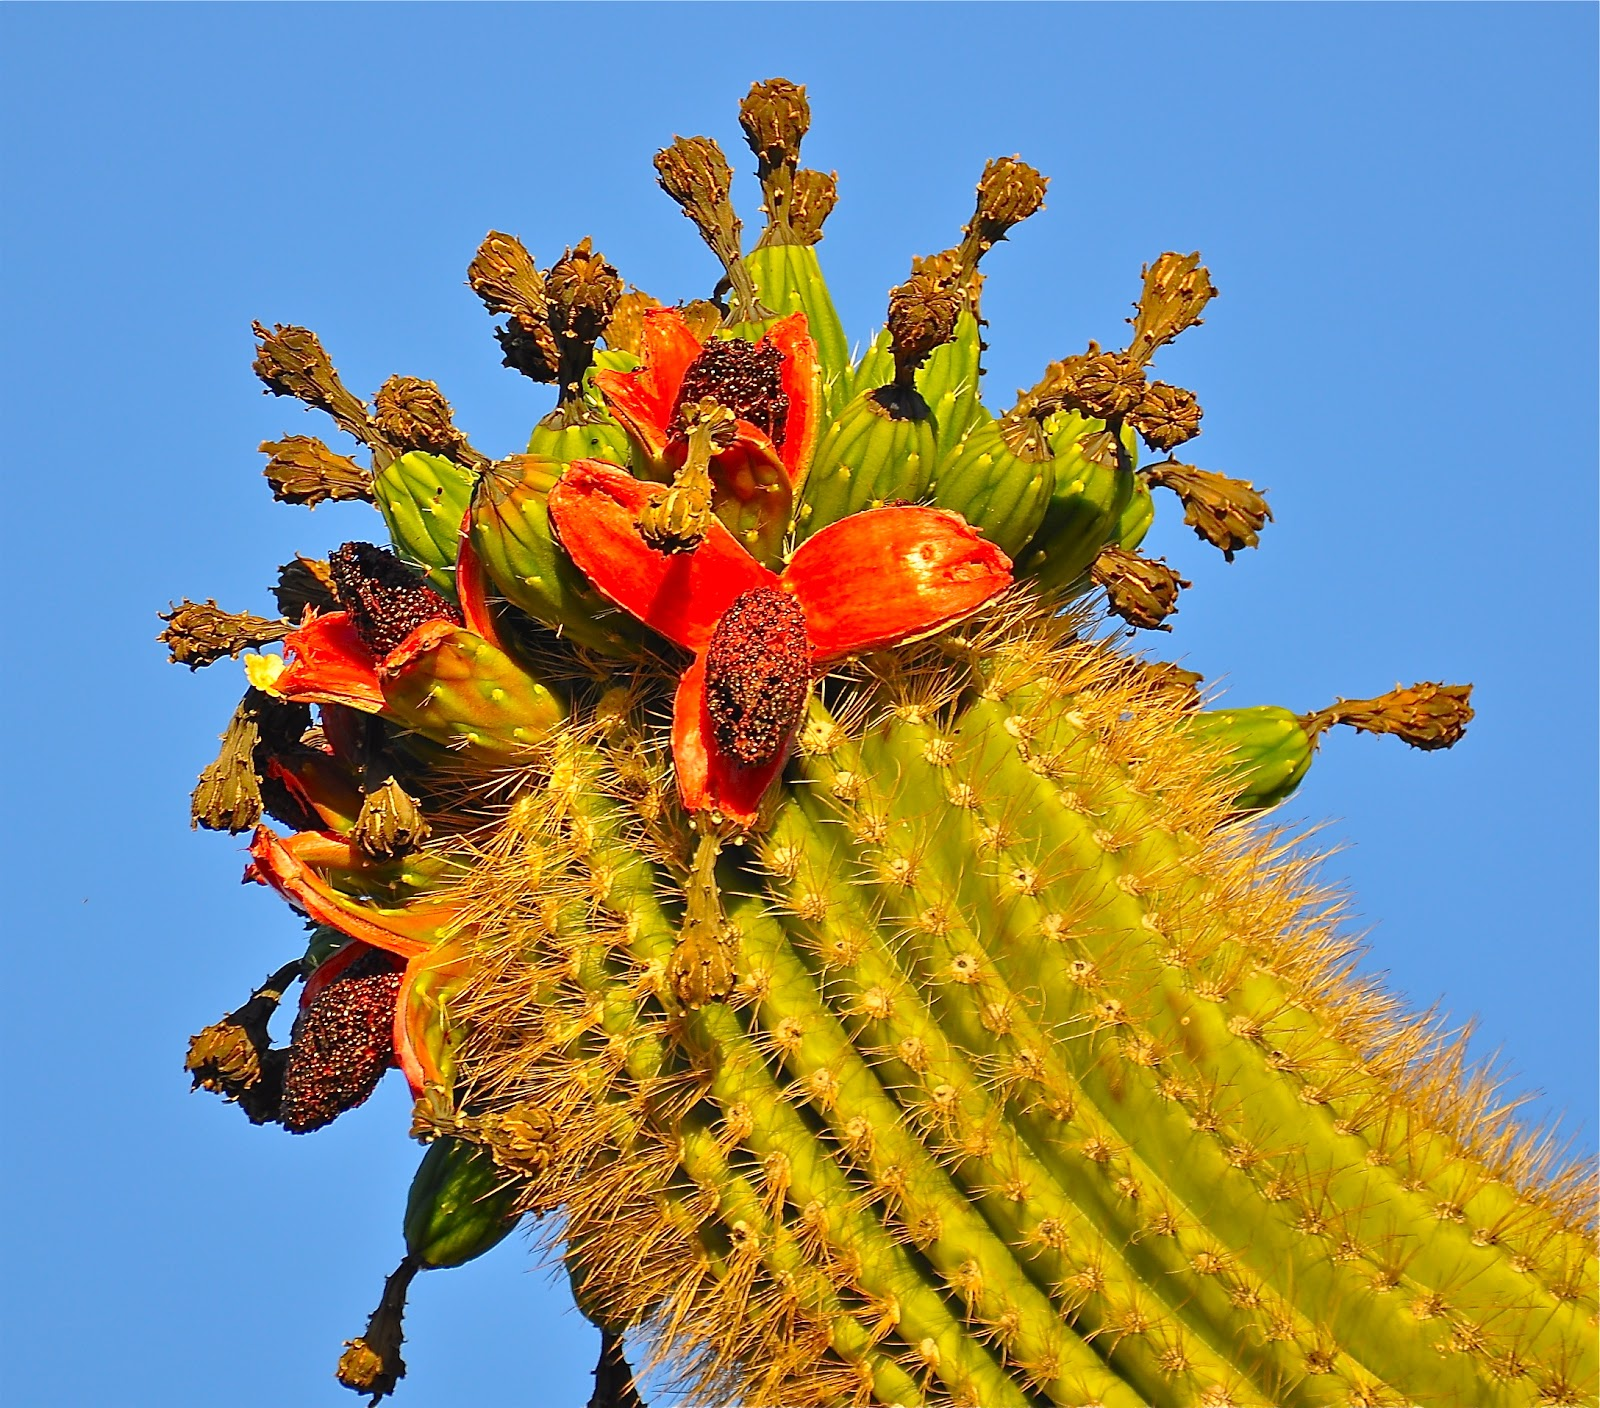 Saguaro Cactus Flowers Photograph by Art Skopec - State of ... |Saguaro Cactus Flowers